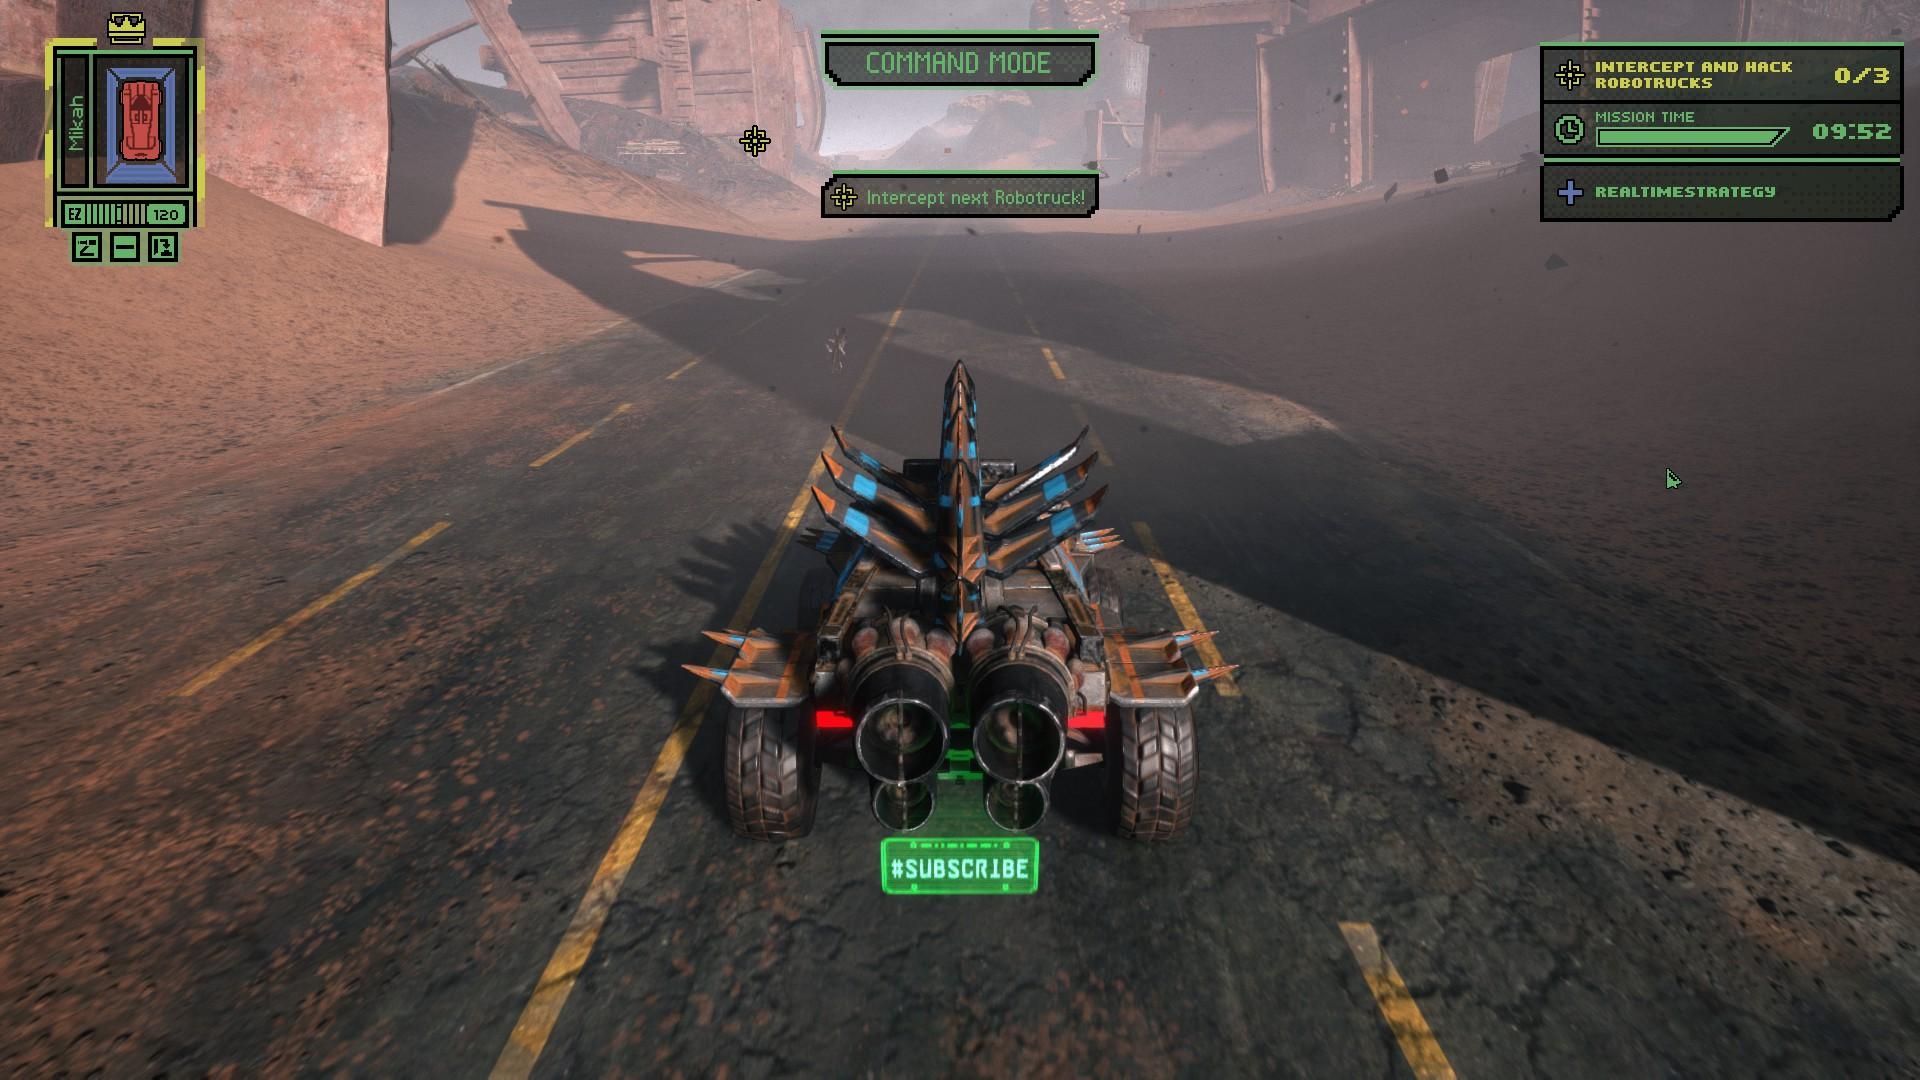 Dark Future is Carmageddon gone strategic | PC Gamer